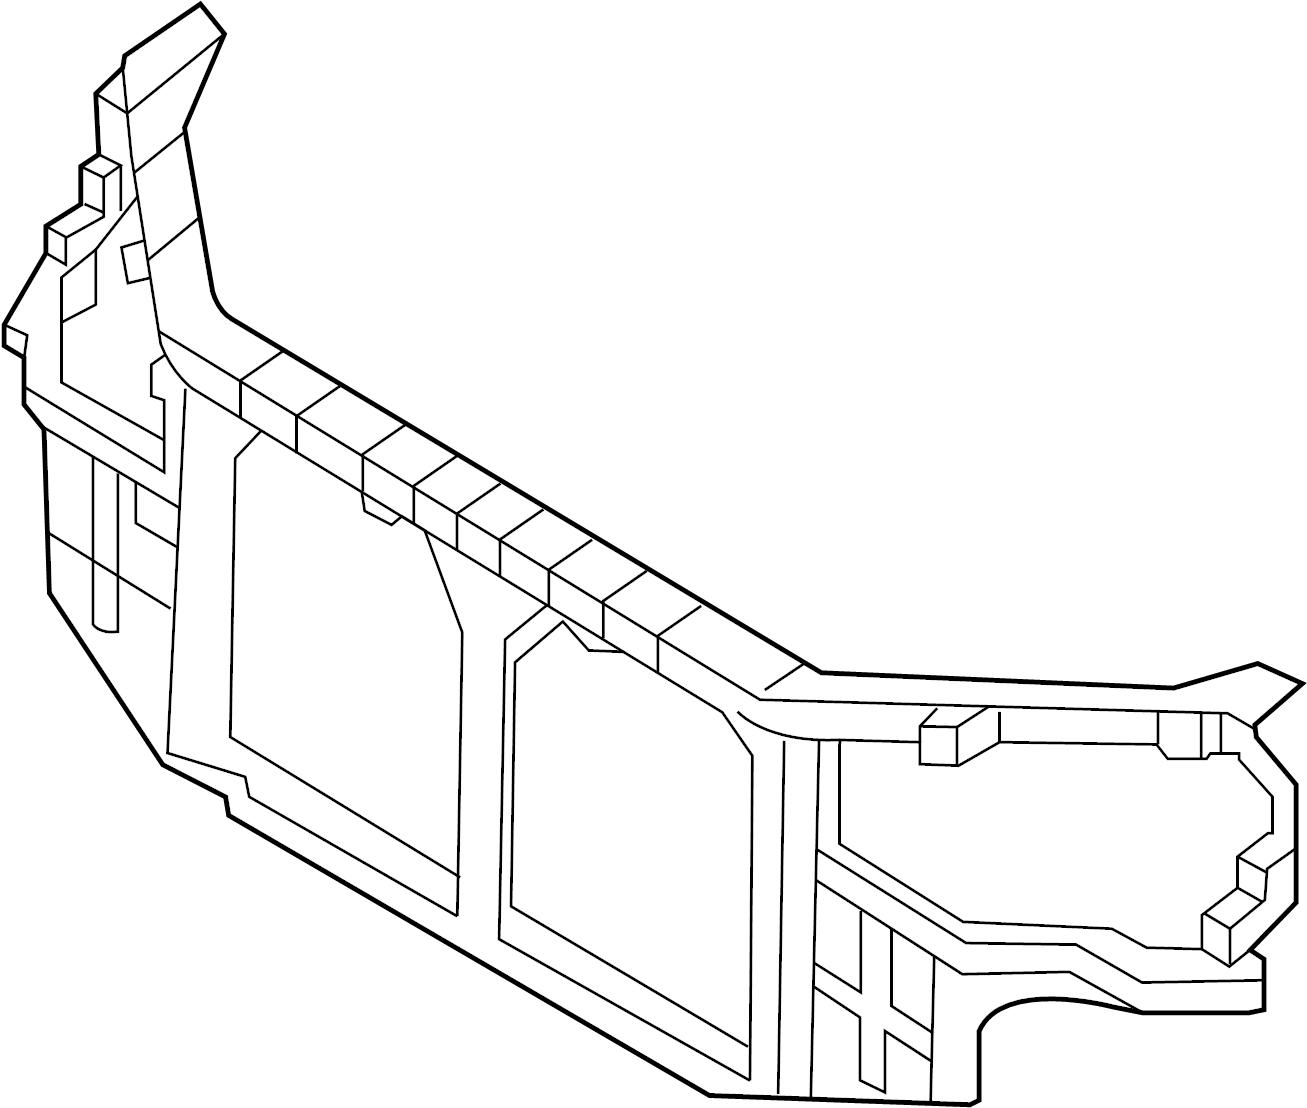 Hyundai Sonata Carrier Assembly